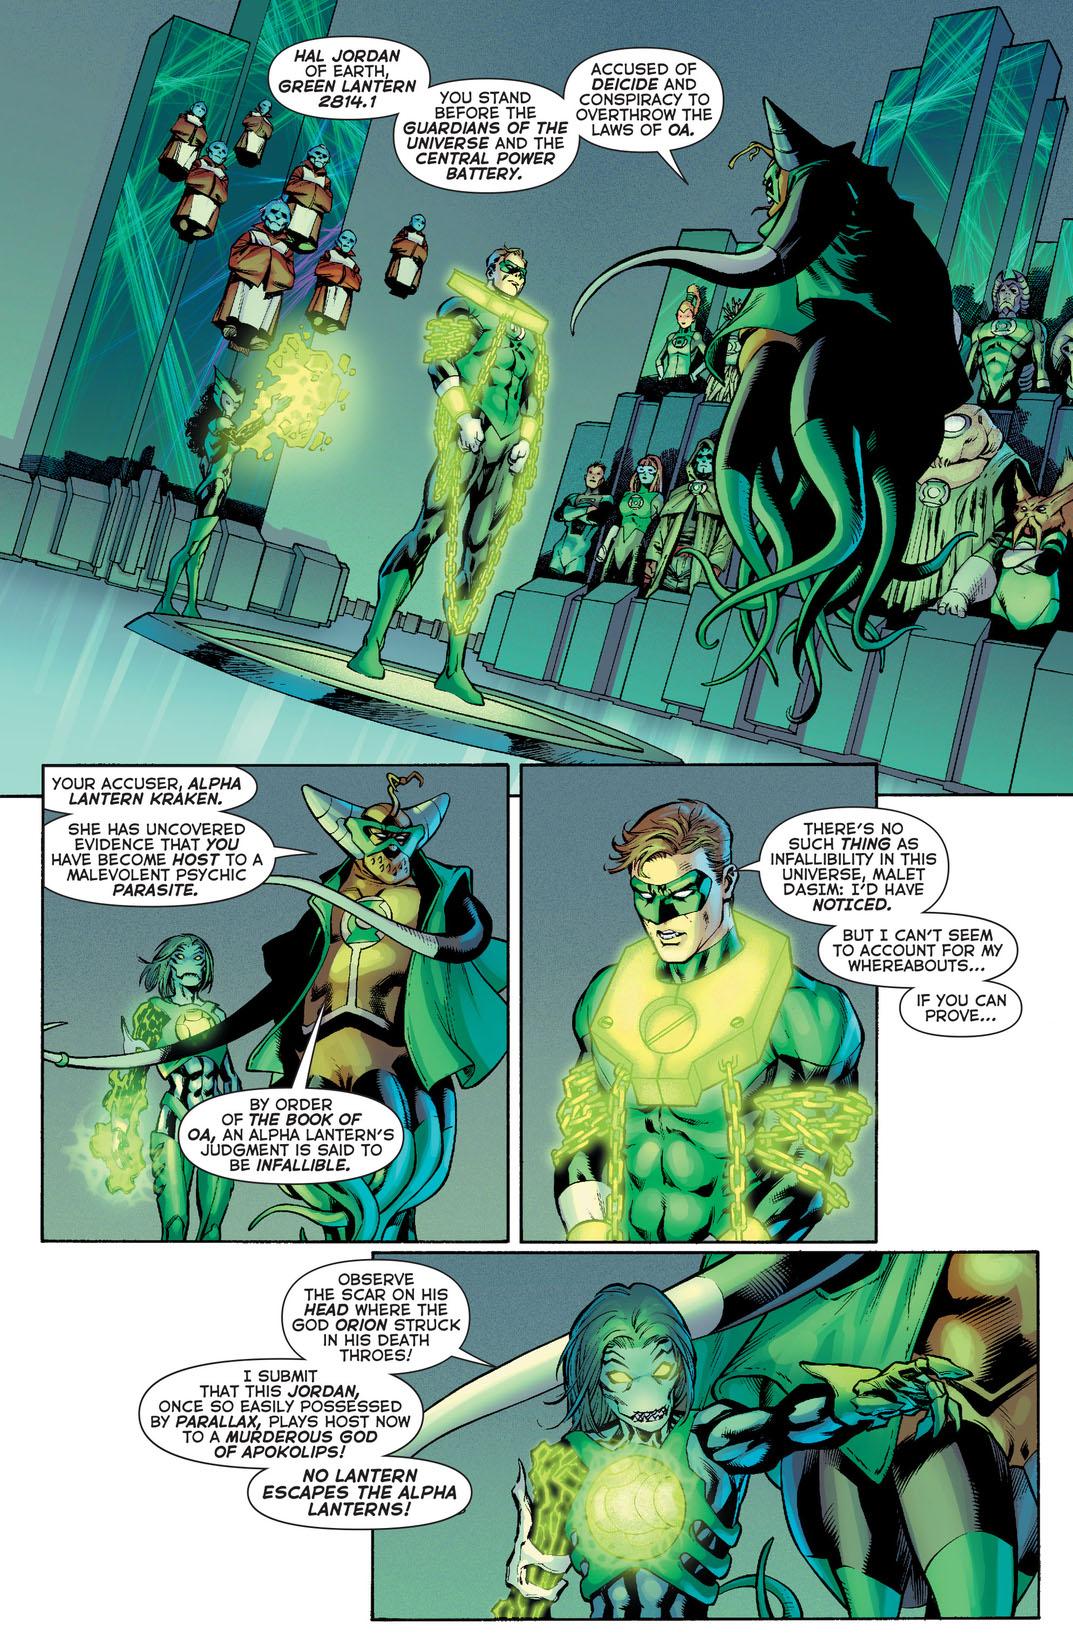 Read Final Crisis (2008-) #5 on DC Universe